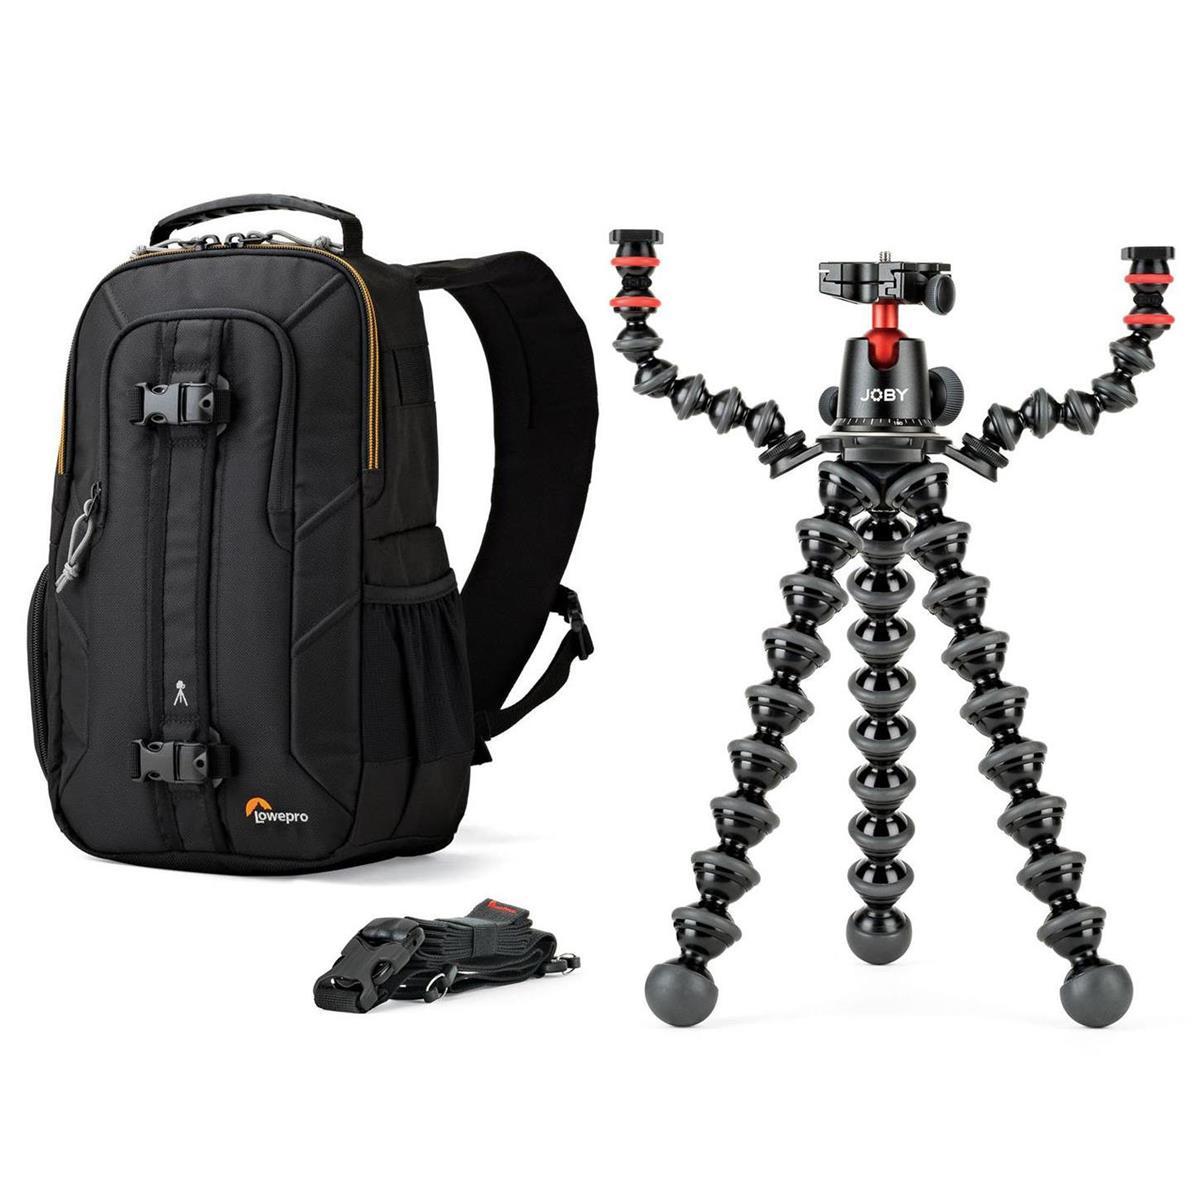 Joby GorillaPod 5K  w/ Additional Mic & Lights Arms + Lowepro Slingshot Edge 150 AW Backpack $110 + free s/h